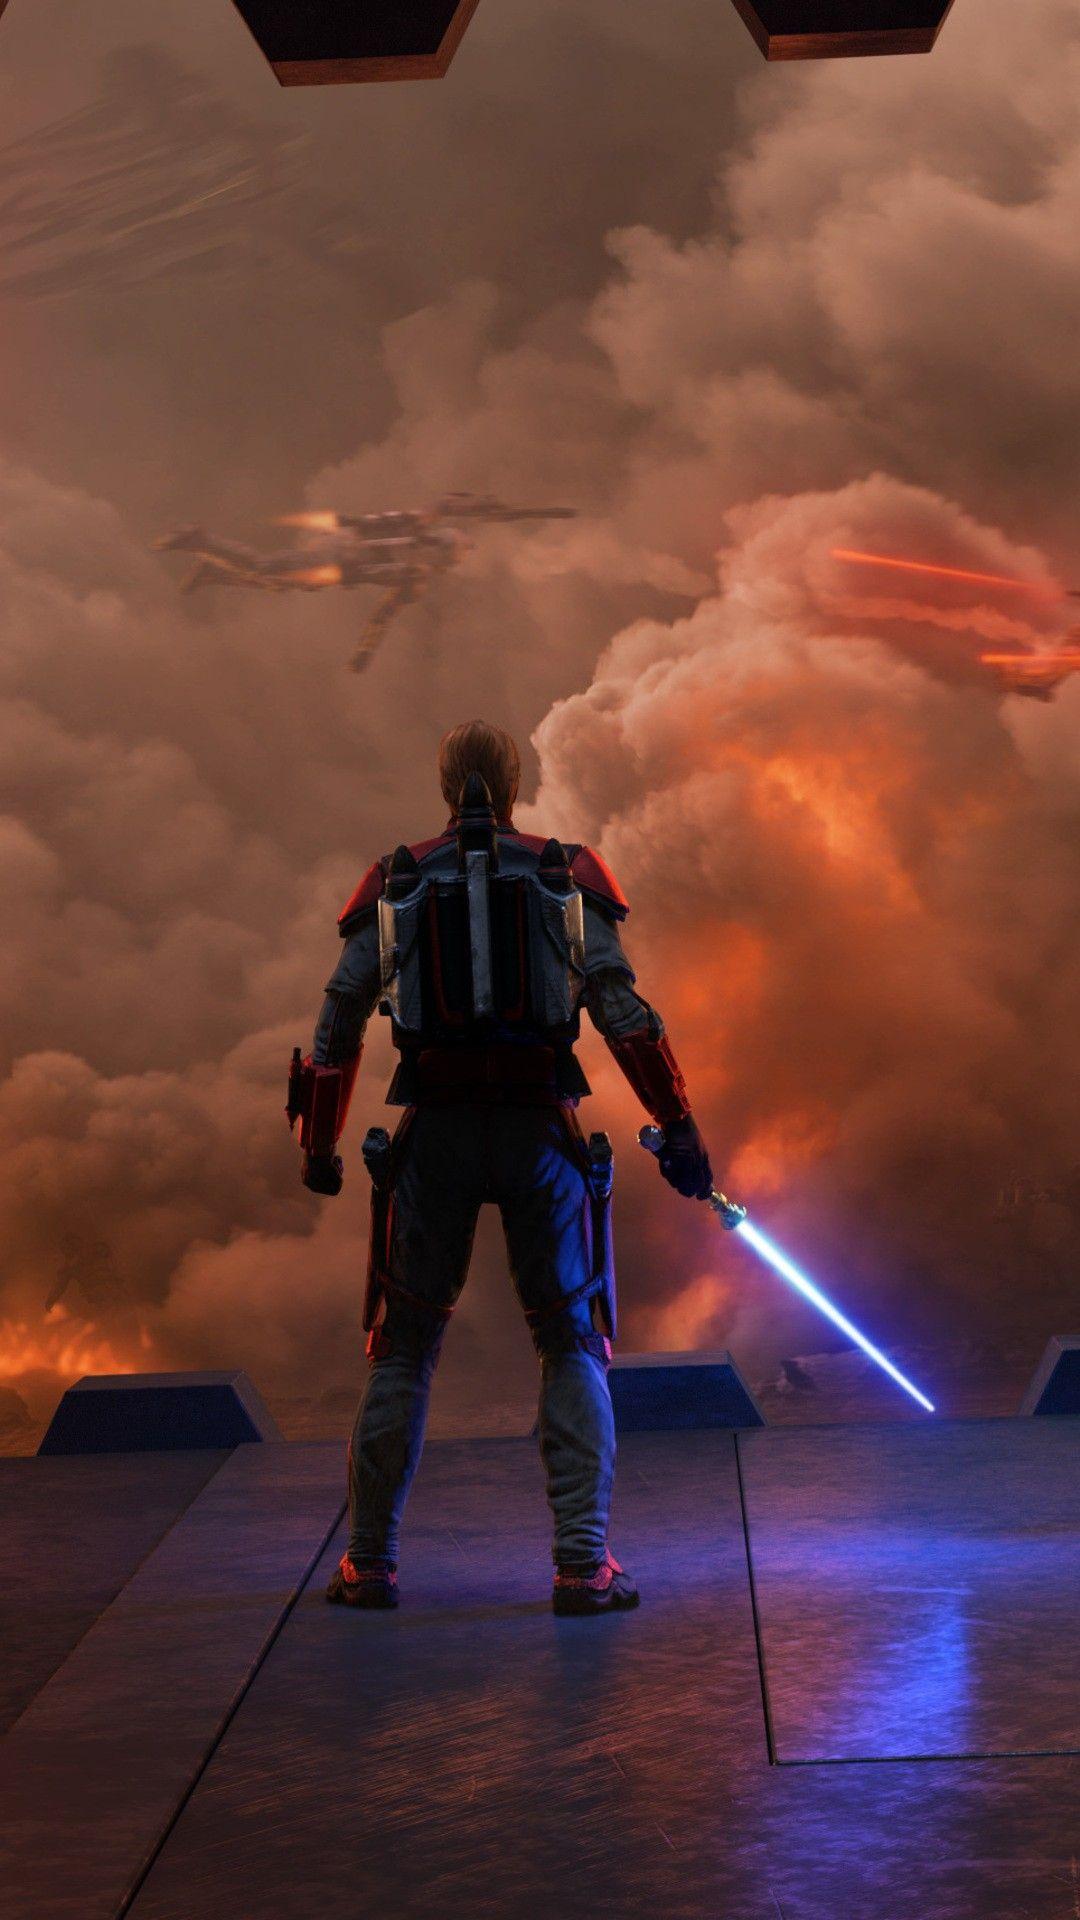 Star Wars Siege Of Mandalore Cs Wallpaper   [1080x1920] The 1080x1920